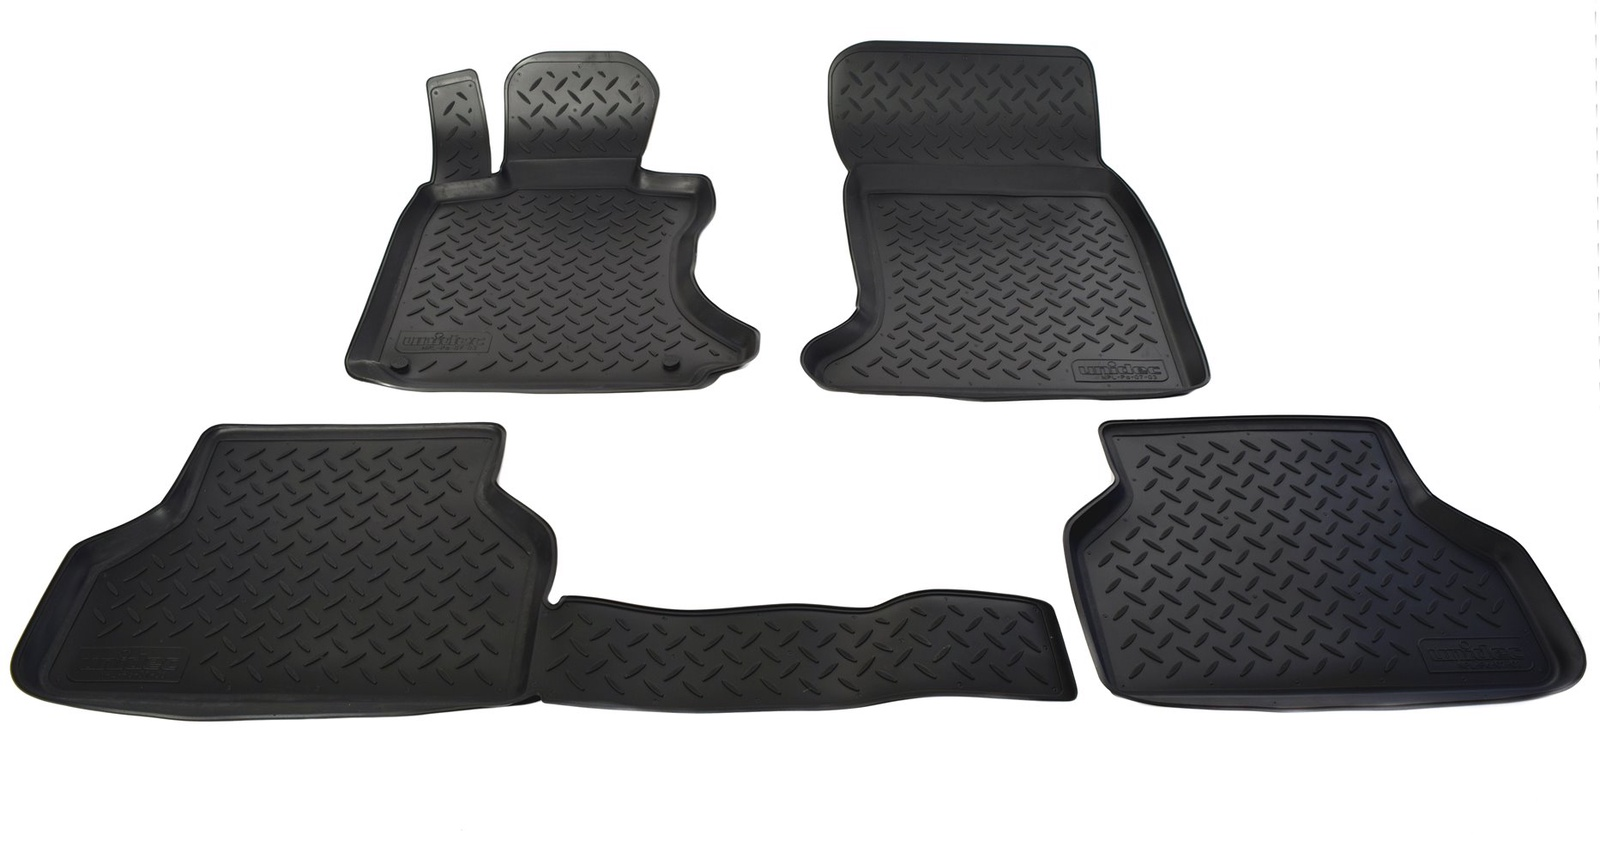 Коврики в салон автомобиля Norplast для BMW 5 E60 2003-2010, NPL-Po-07-03, черный rambach bmw 525d e61 197 л с